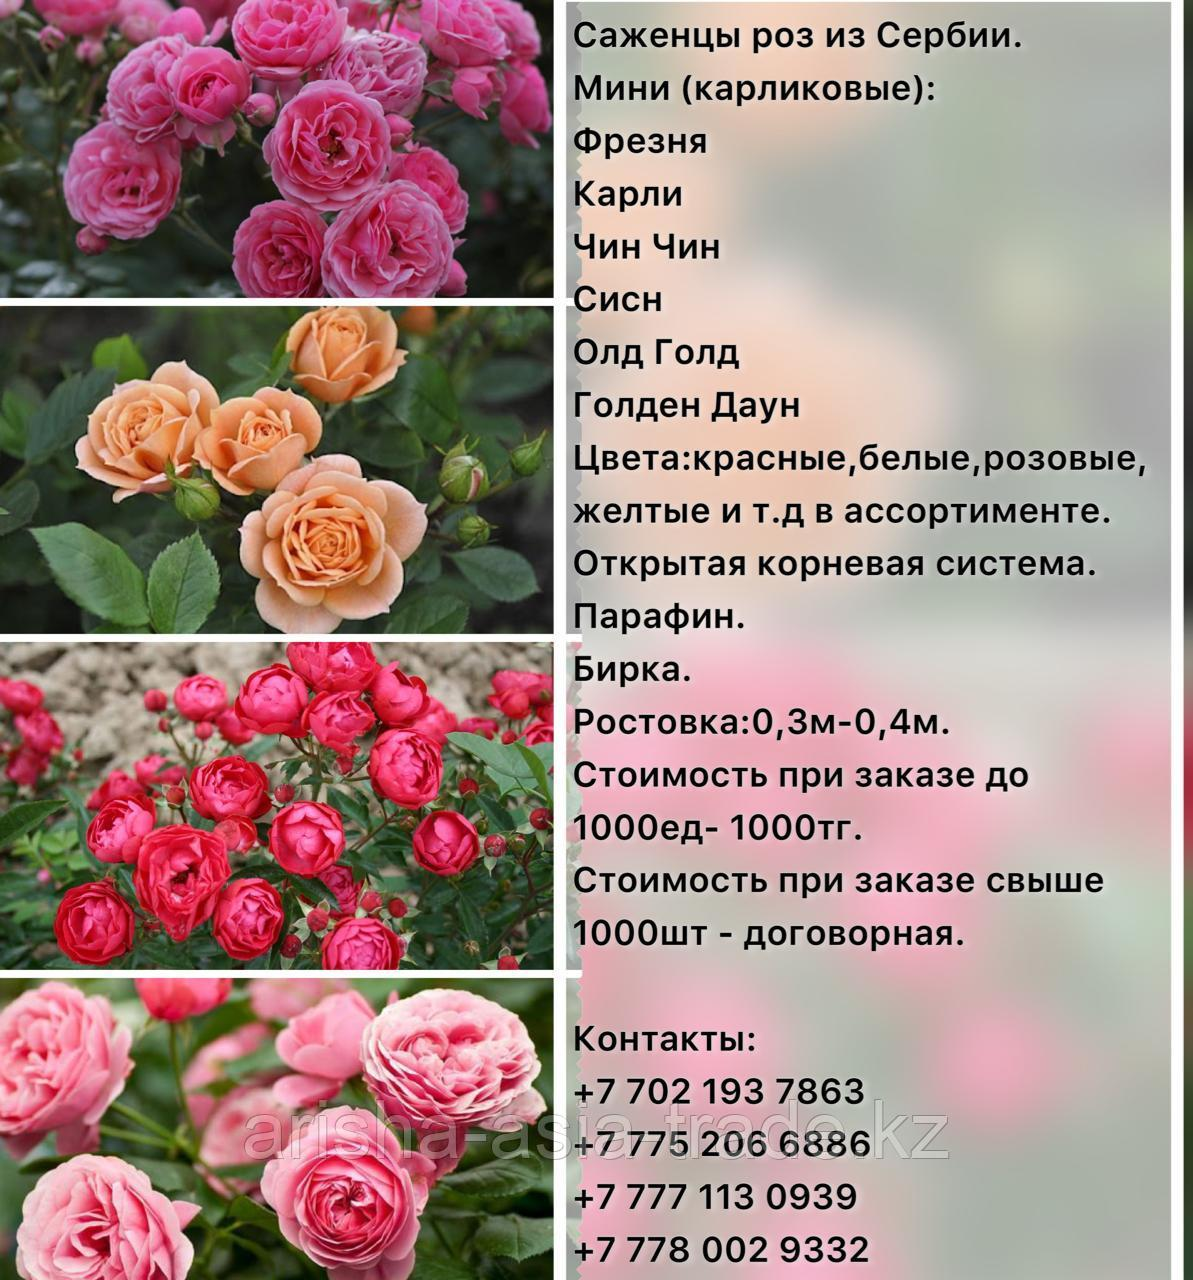 Саженец розы мини Сербия